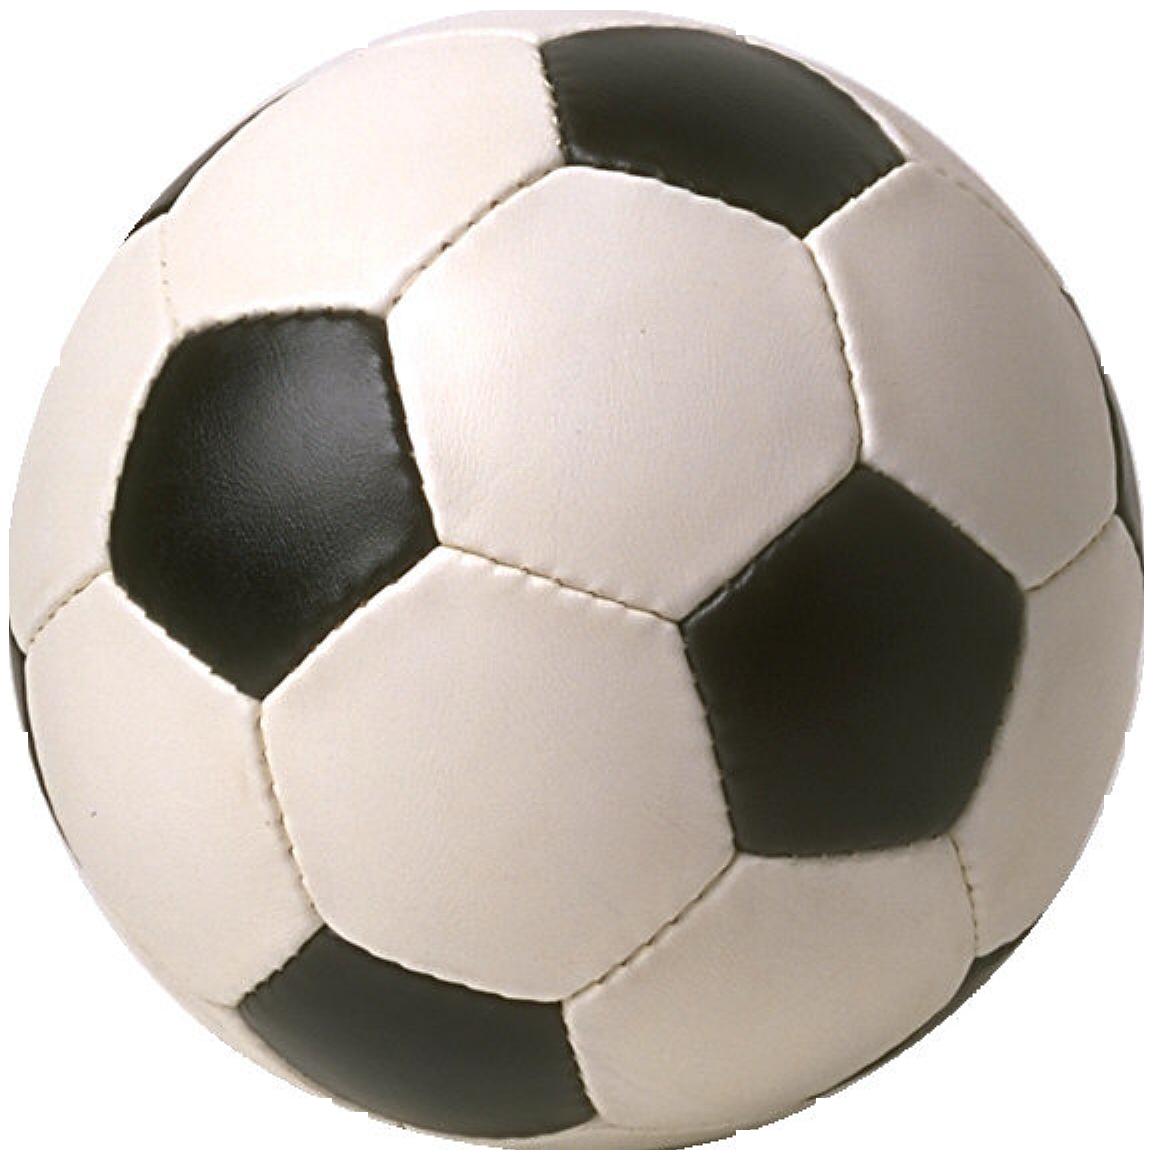 Football PNG - 187